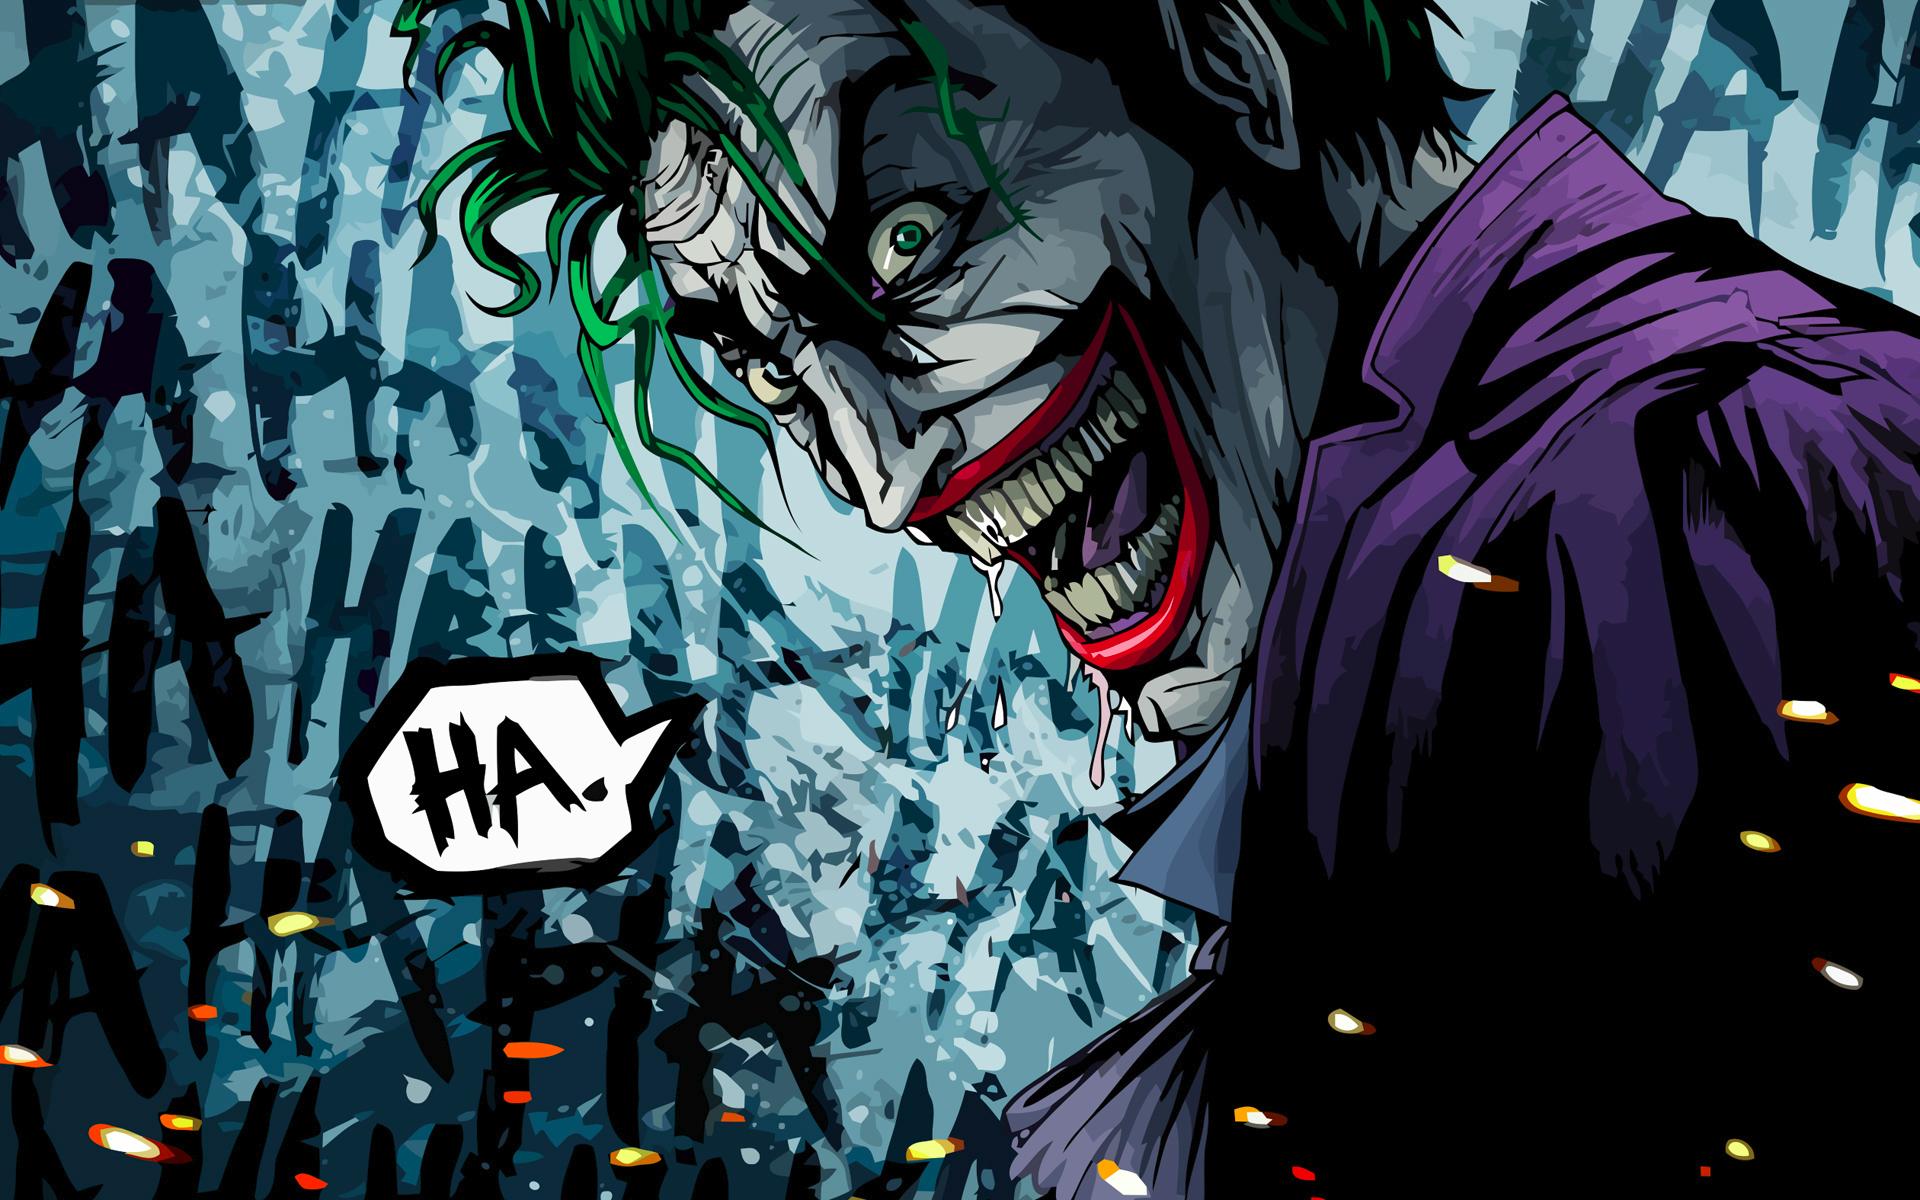 Joker Full HD Wallpaper and Background Image | 1920x1200 ...